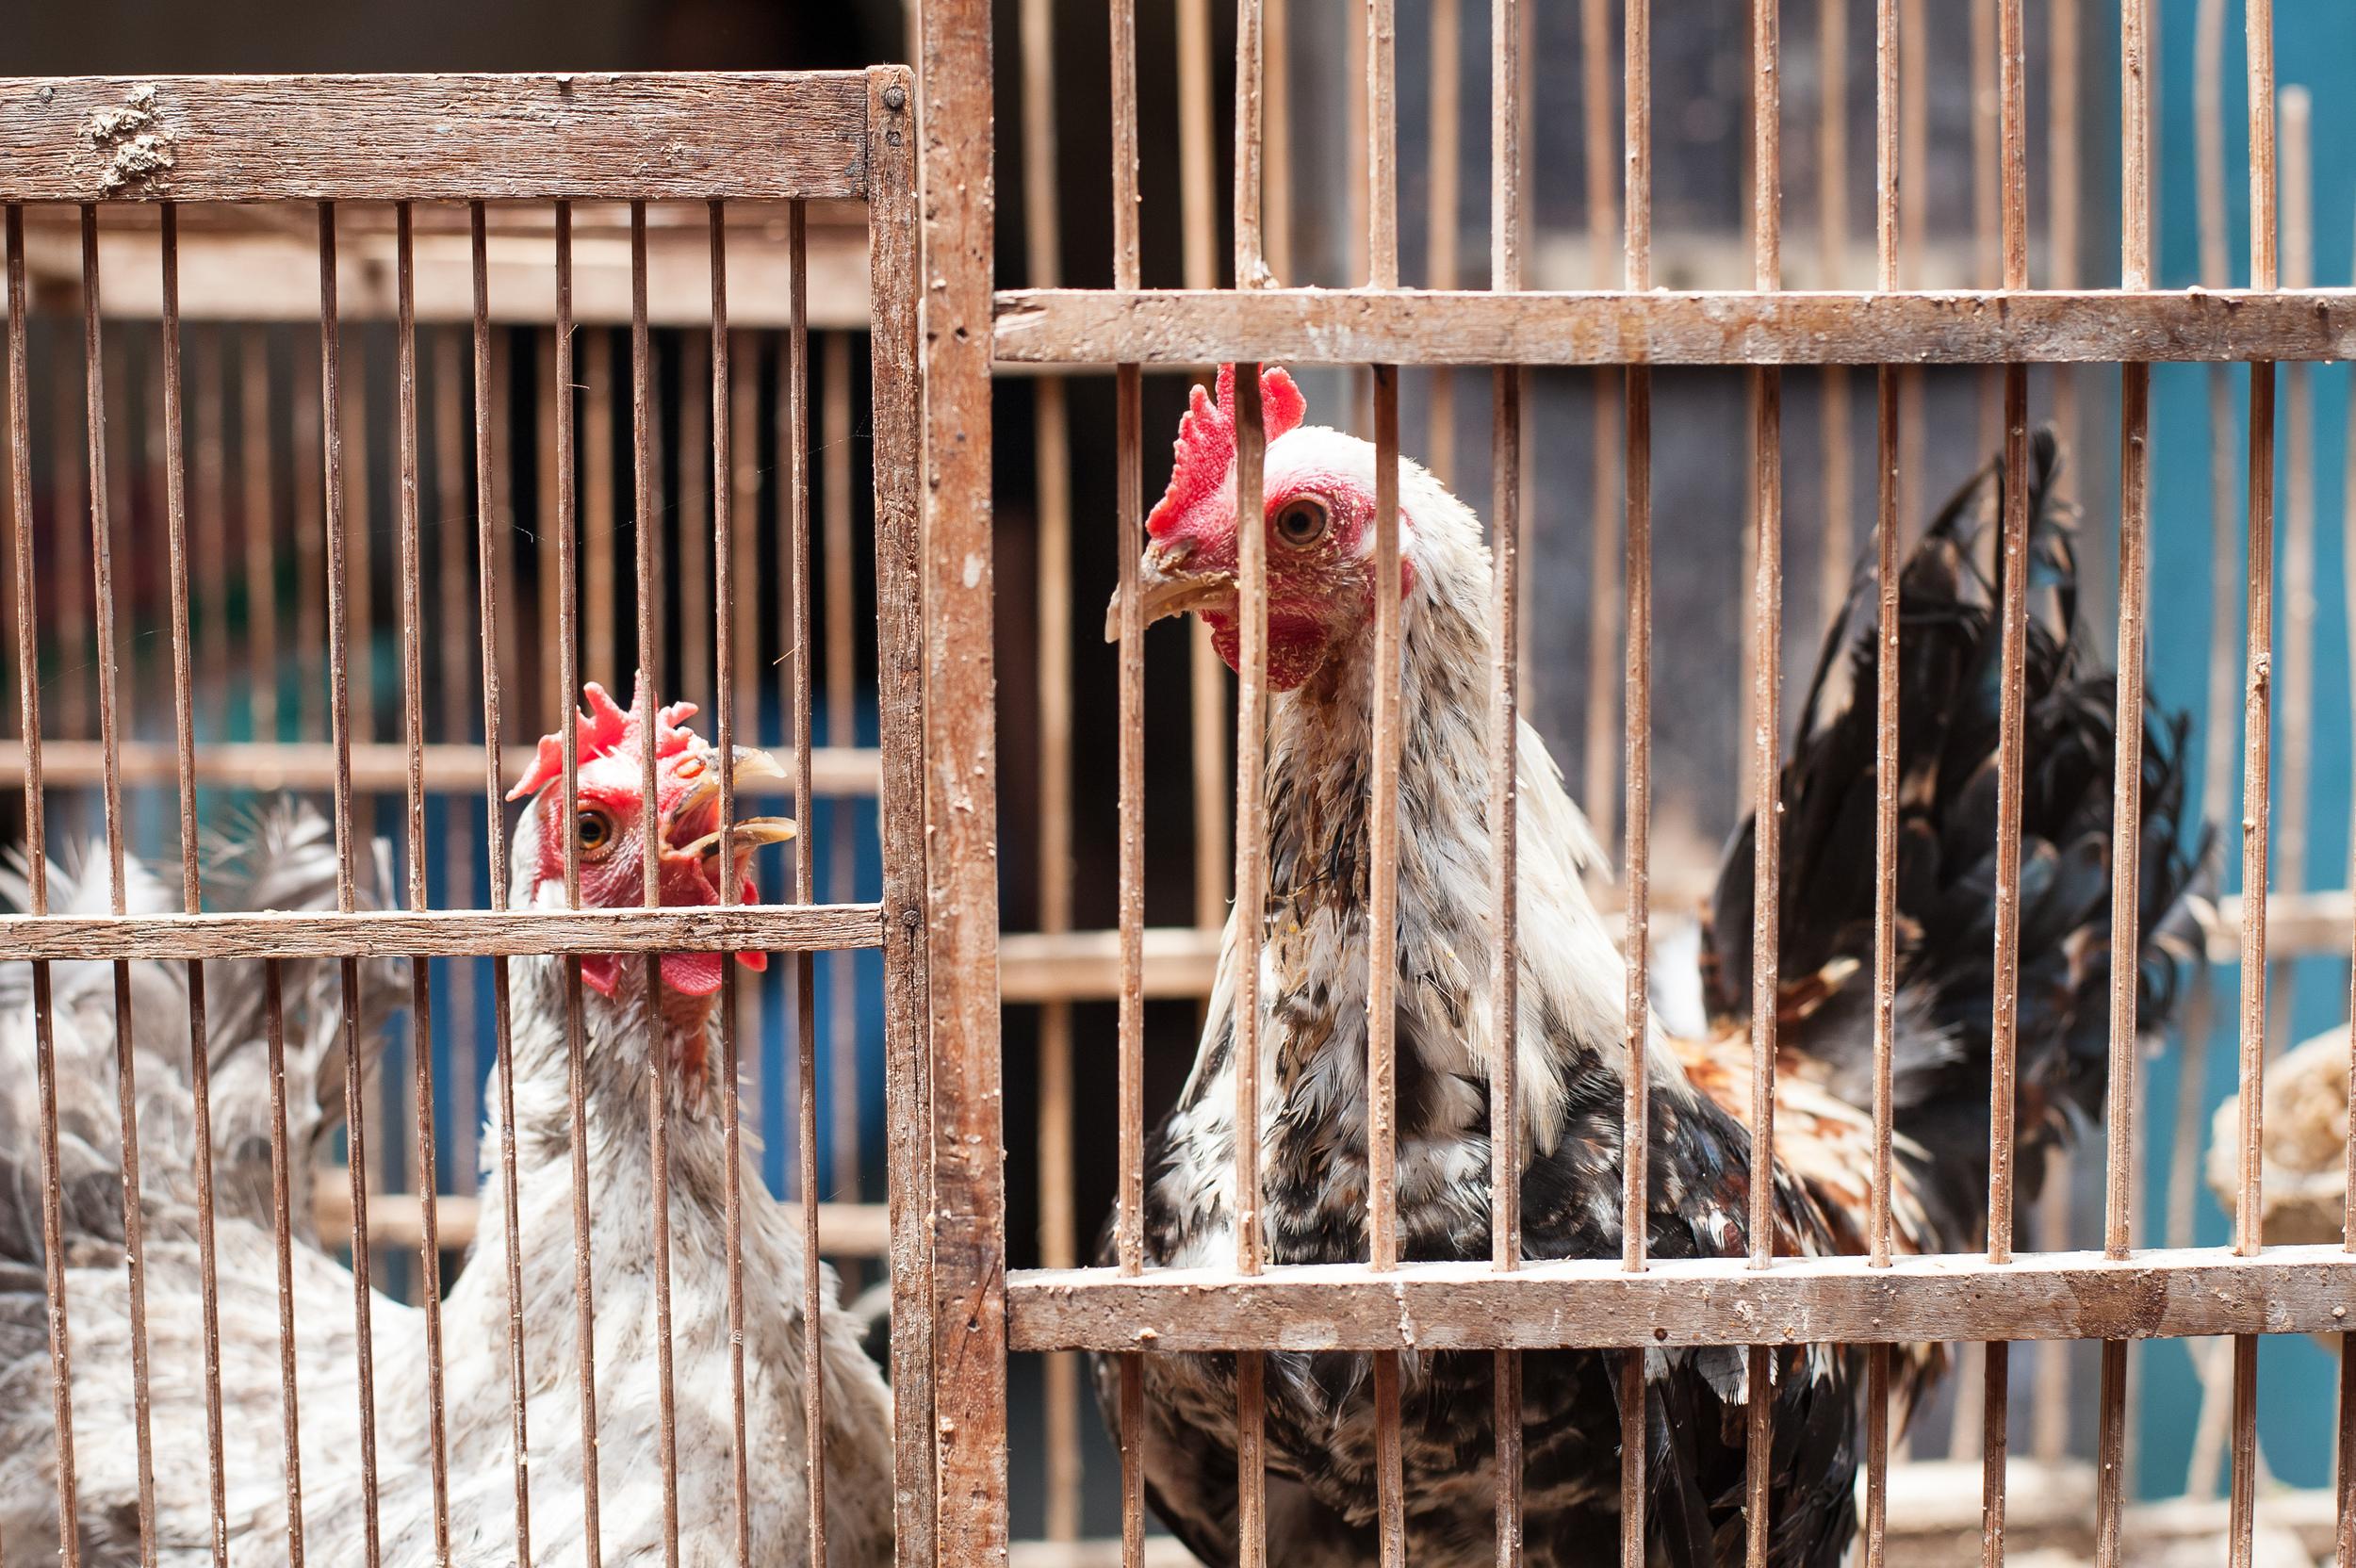 caged-chickens.jpg